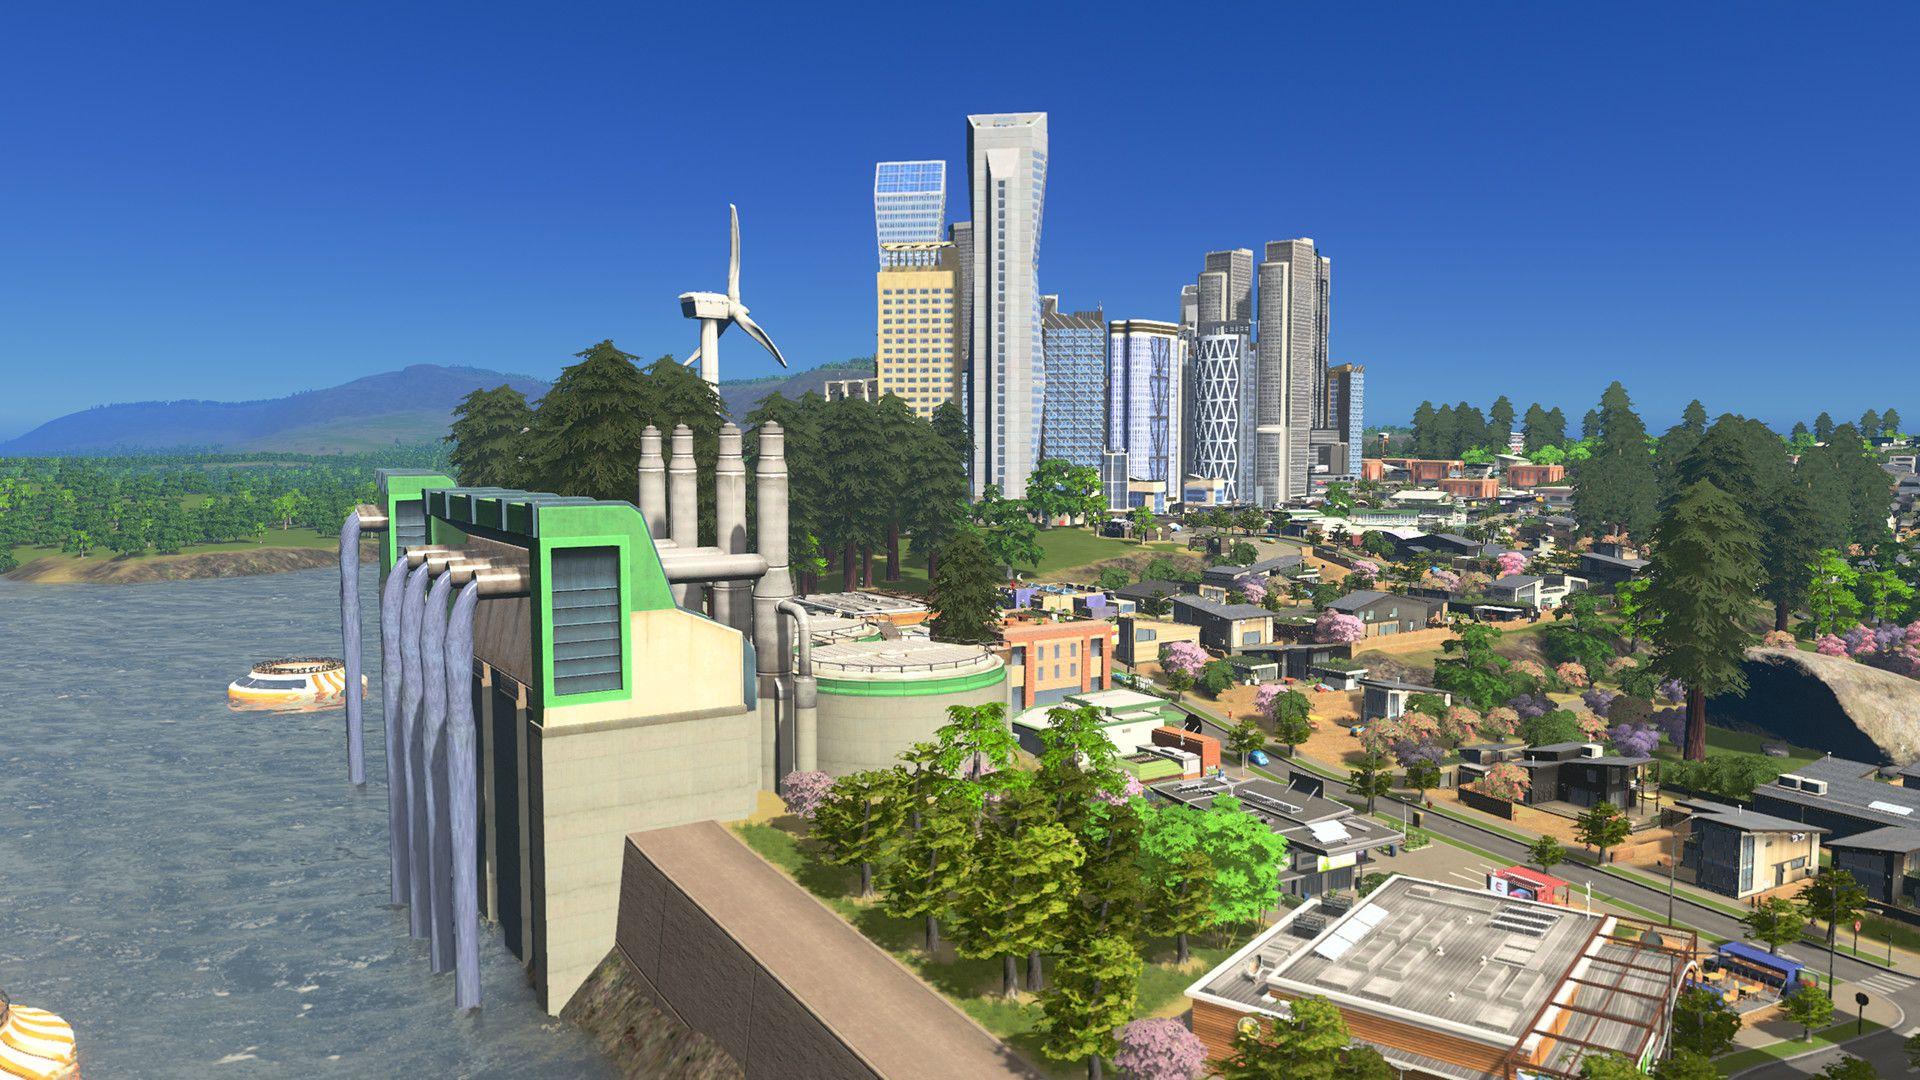 CITIESGREENCITIES4.jpg